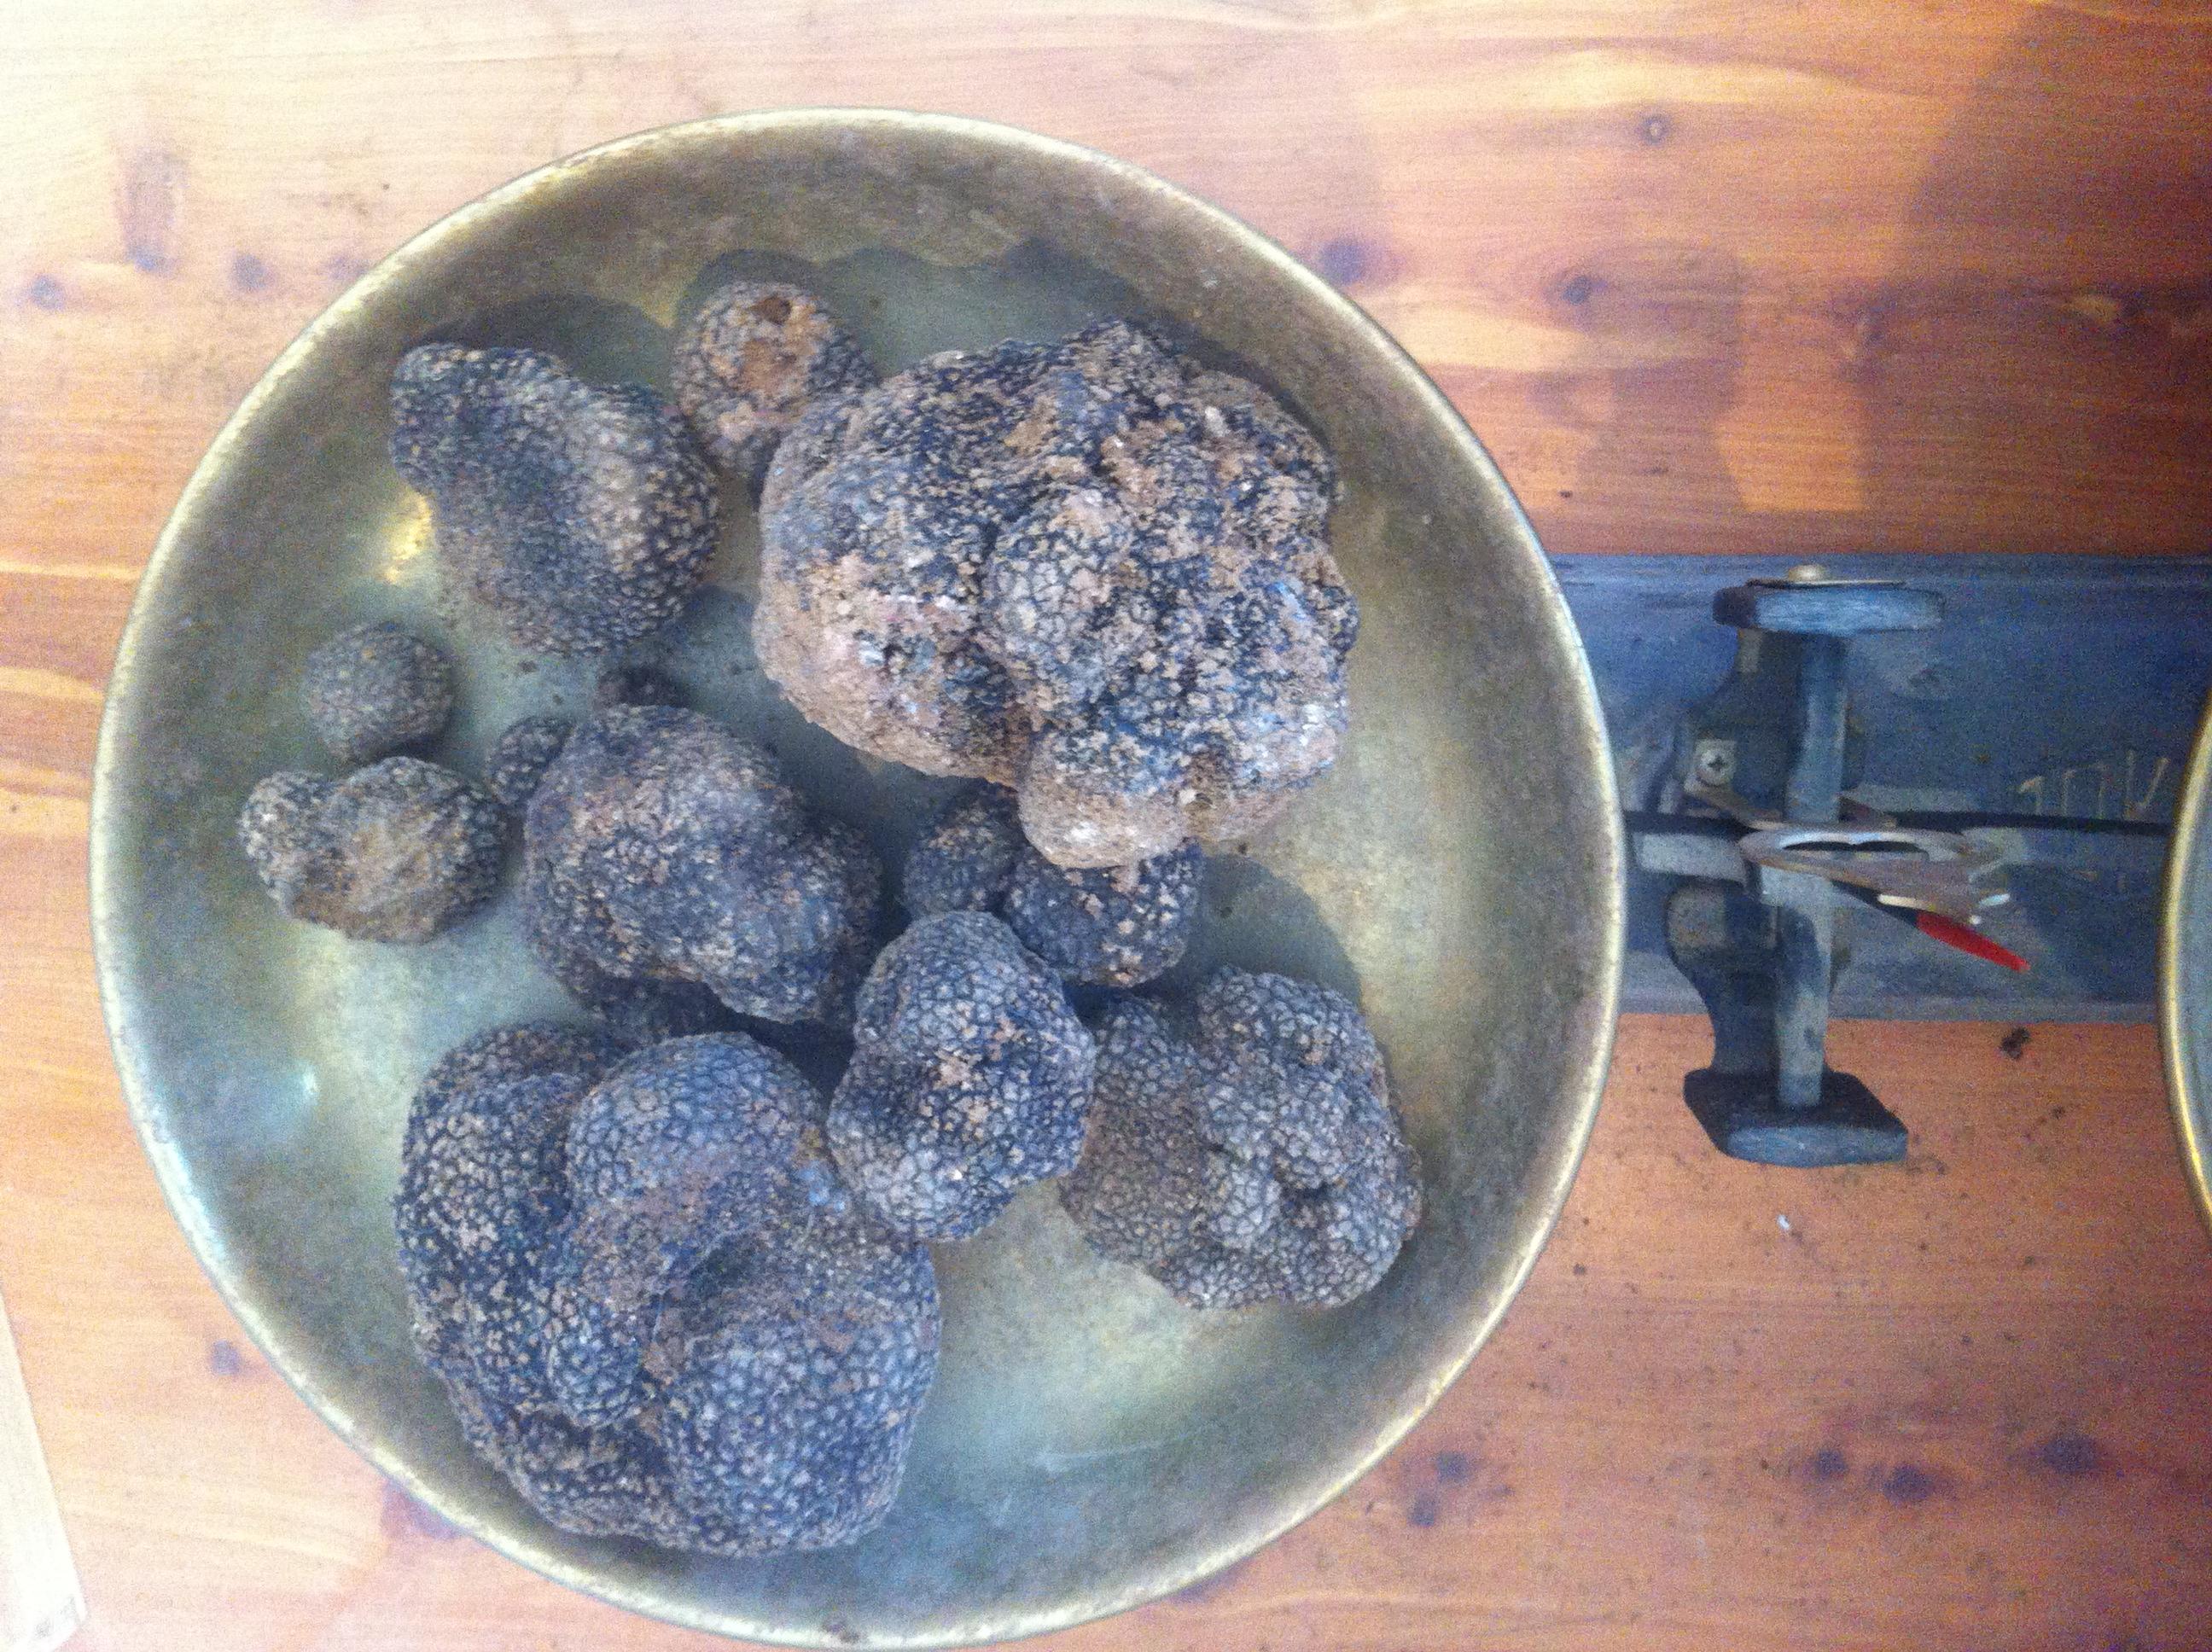 La Trufa Negra se caza, se come y se duerme – Tuber Melanosporum #trufiturismo, Mario Schumacher Blog